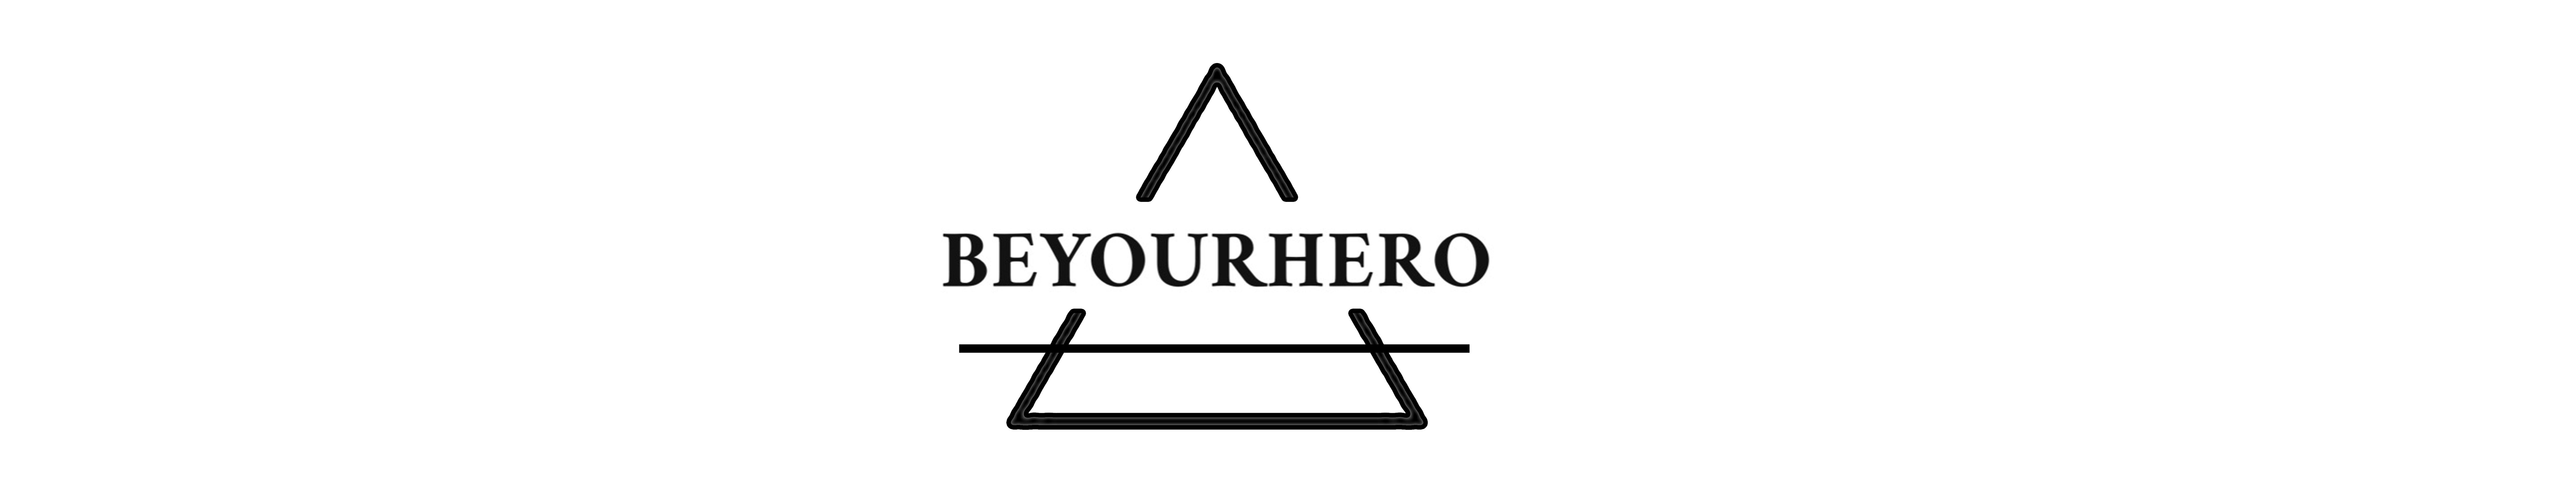 beyourHero